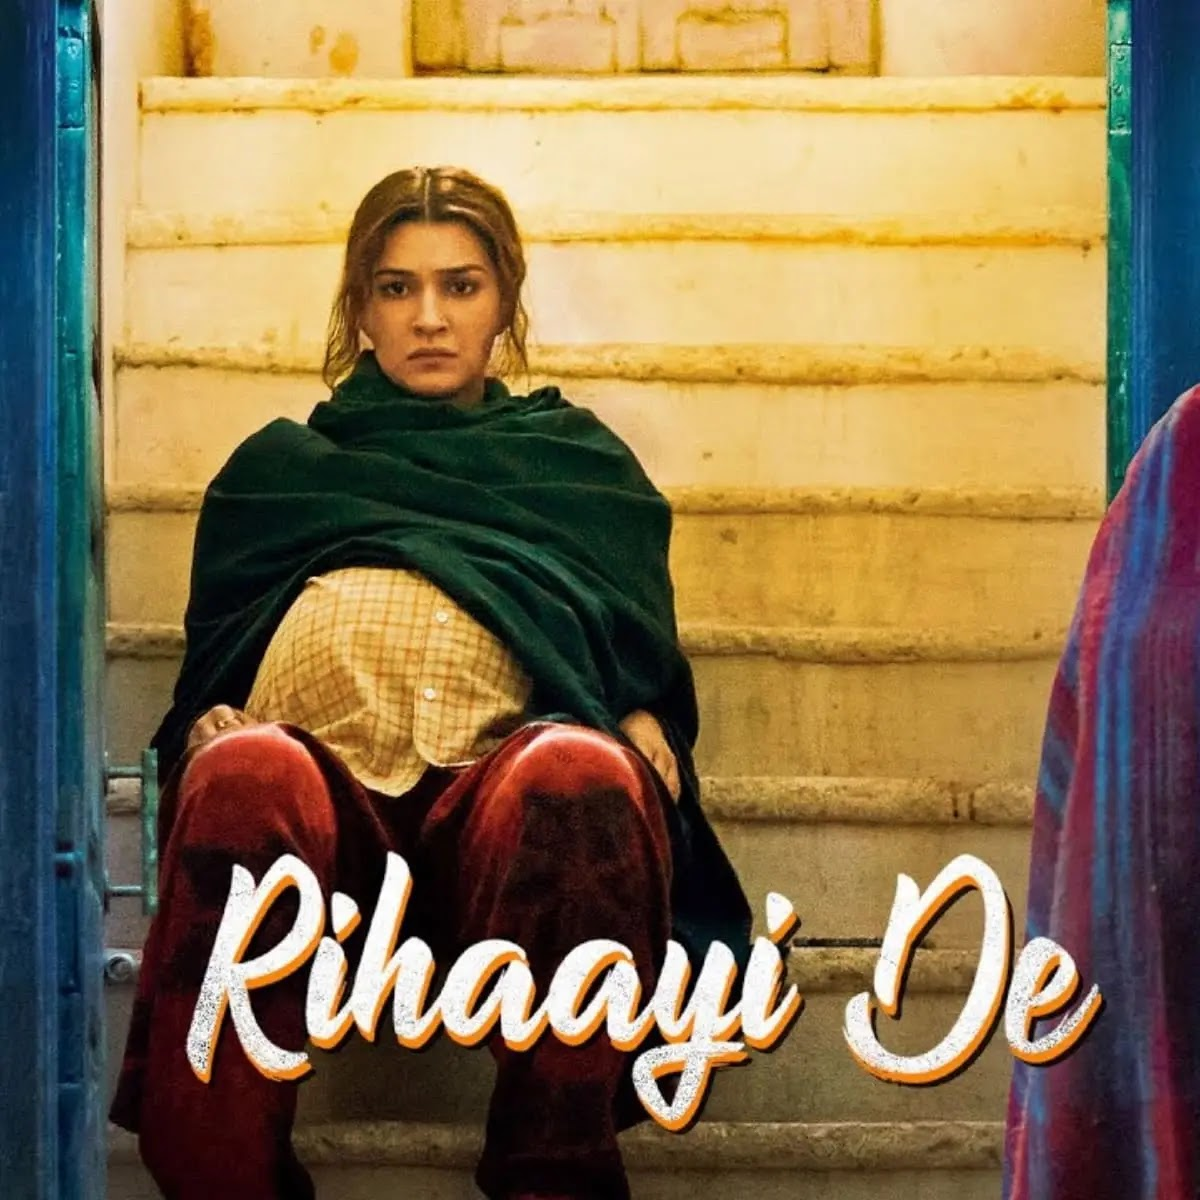 Rihaayi De Mimi Mp3 Song Download 320kbps Free